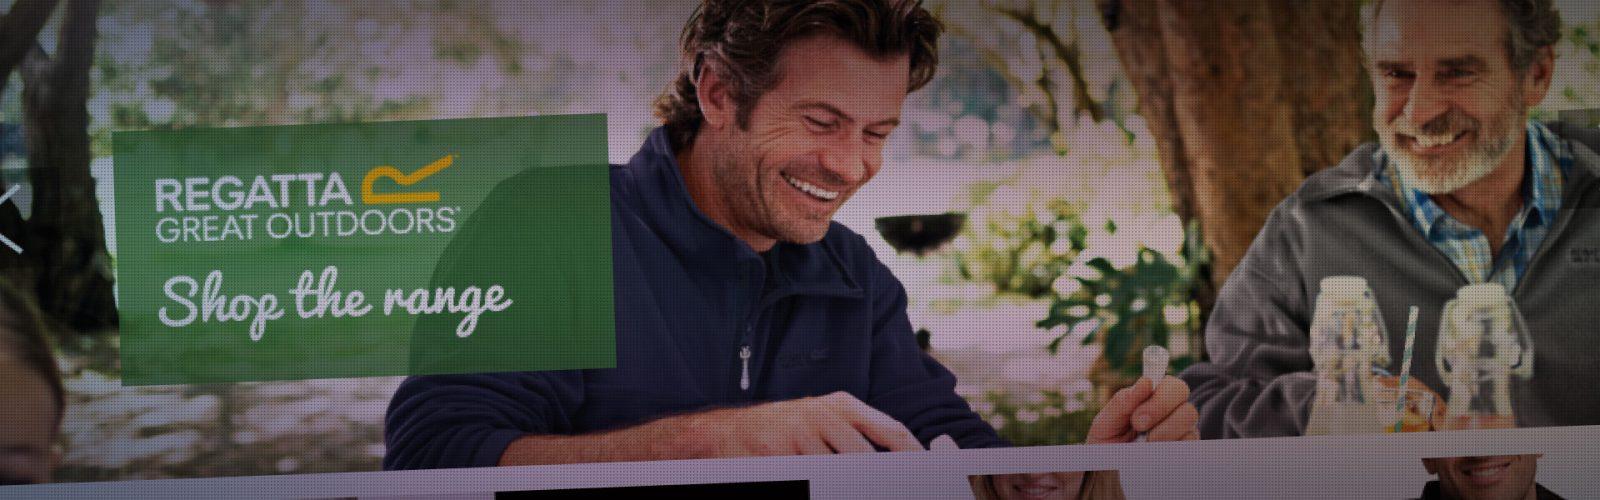 Mole Valley Farmers Website Design